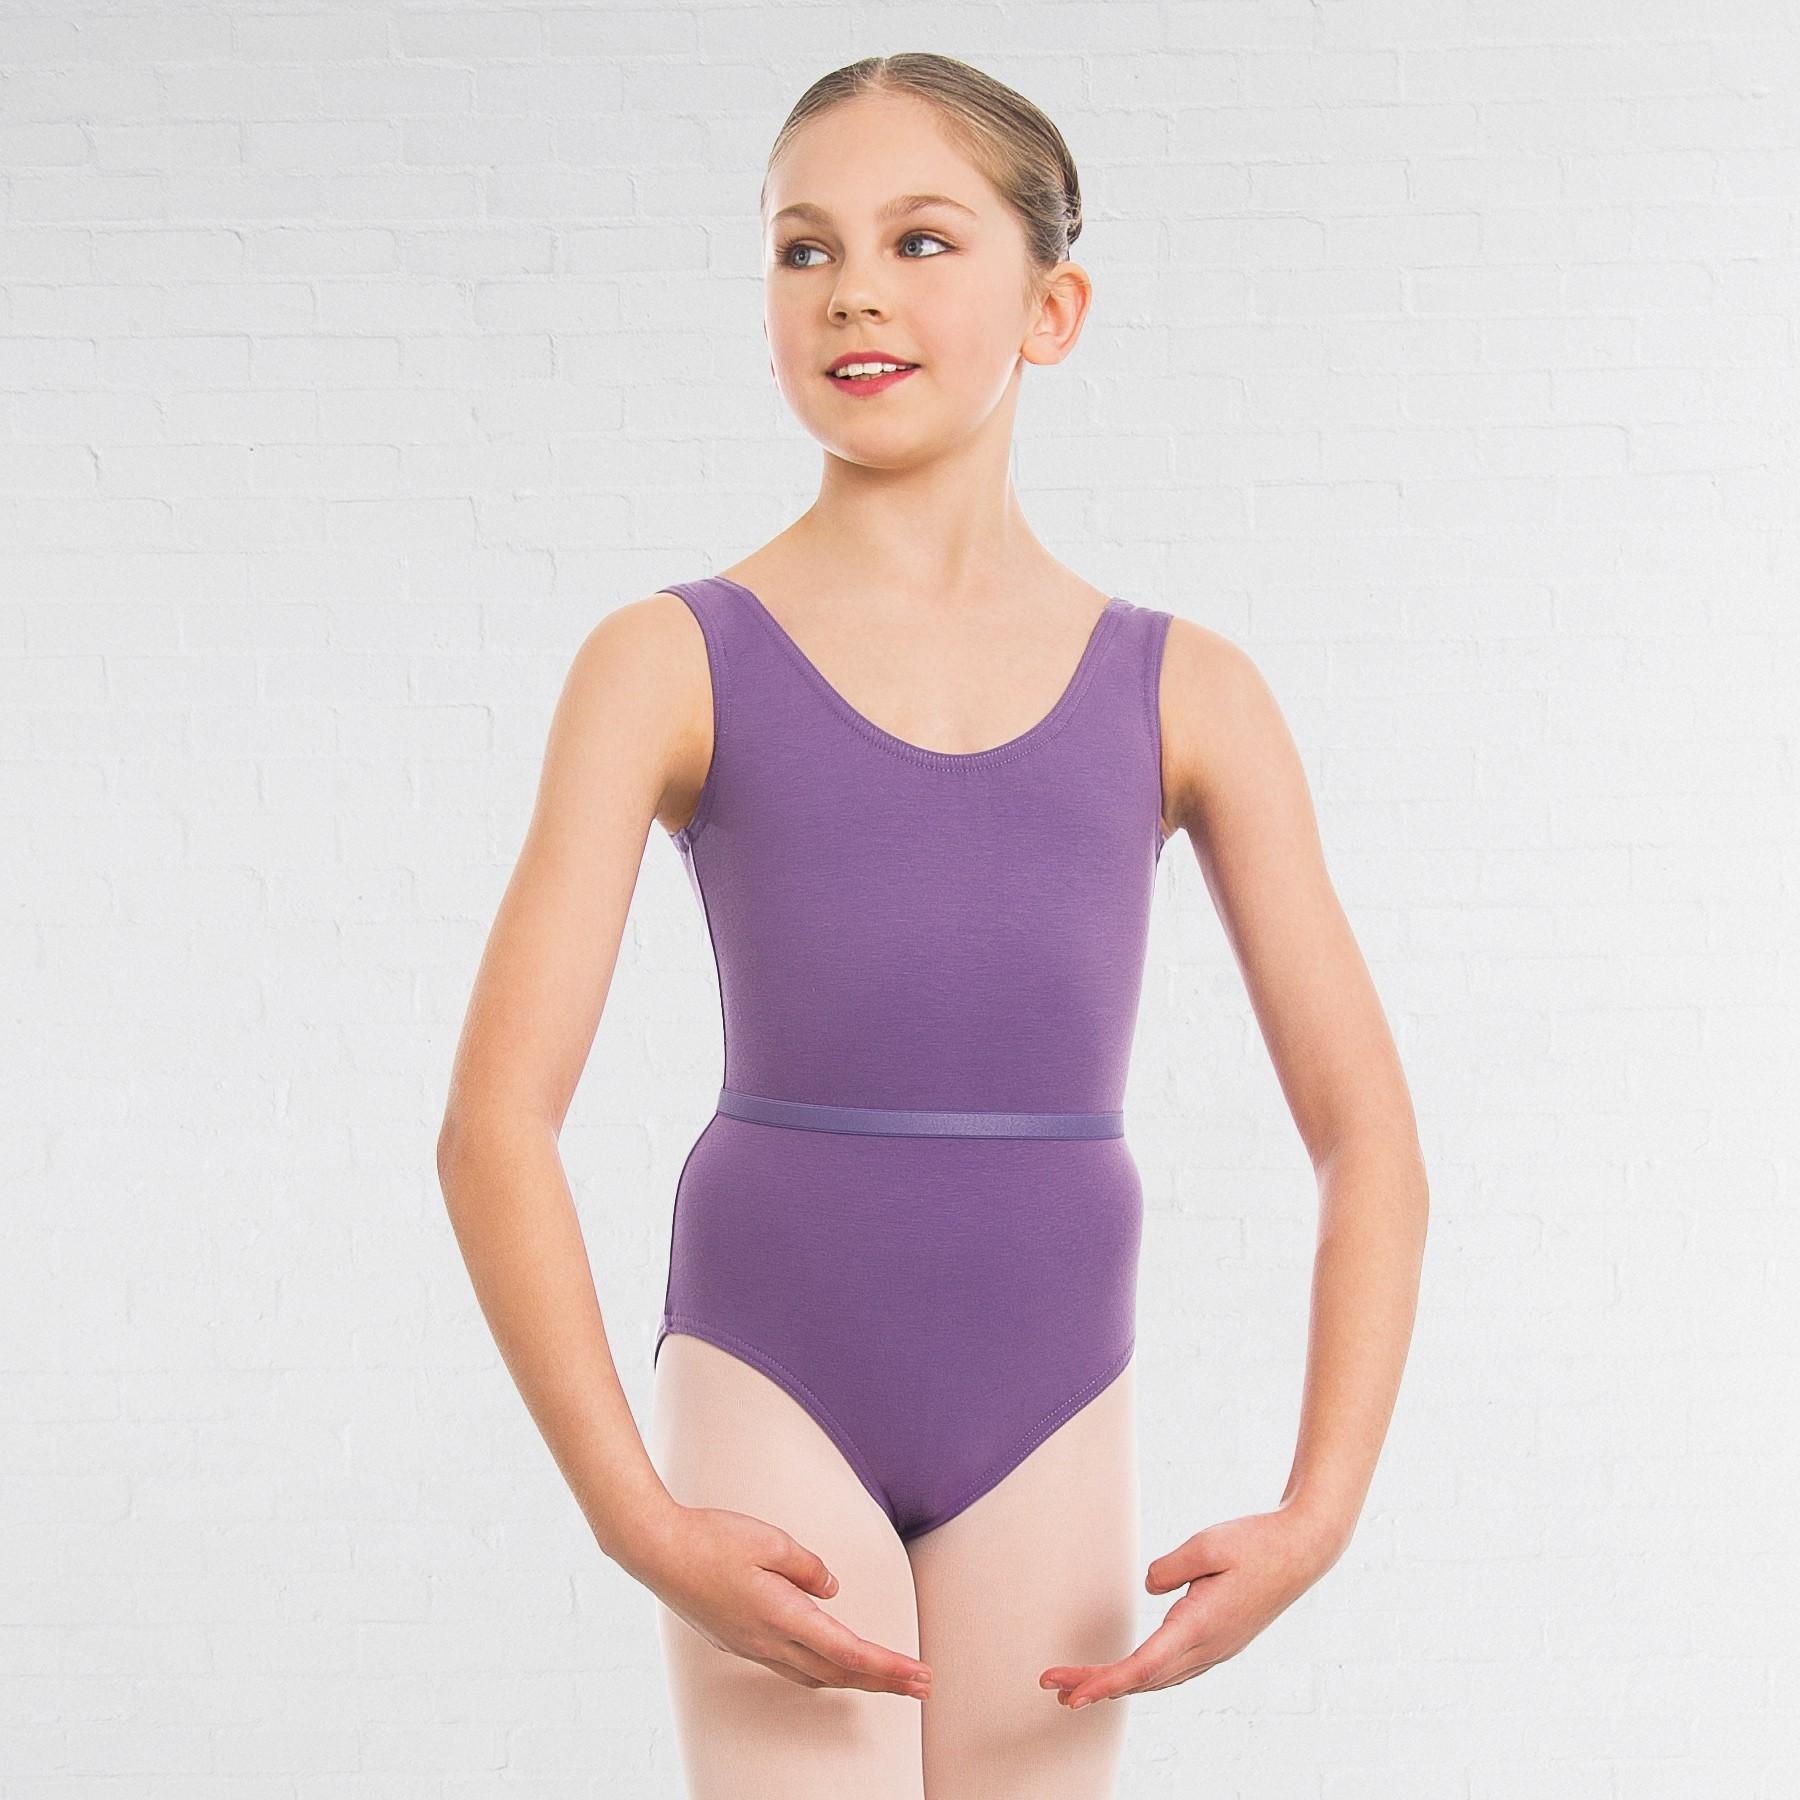 1st Position Laura Grades 1-5 Leotard (Lavender)